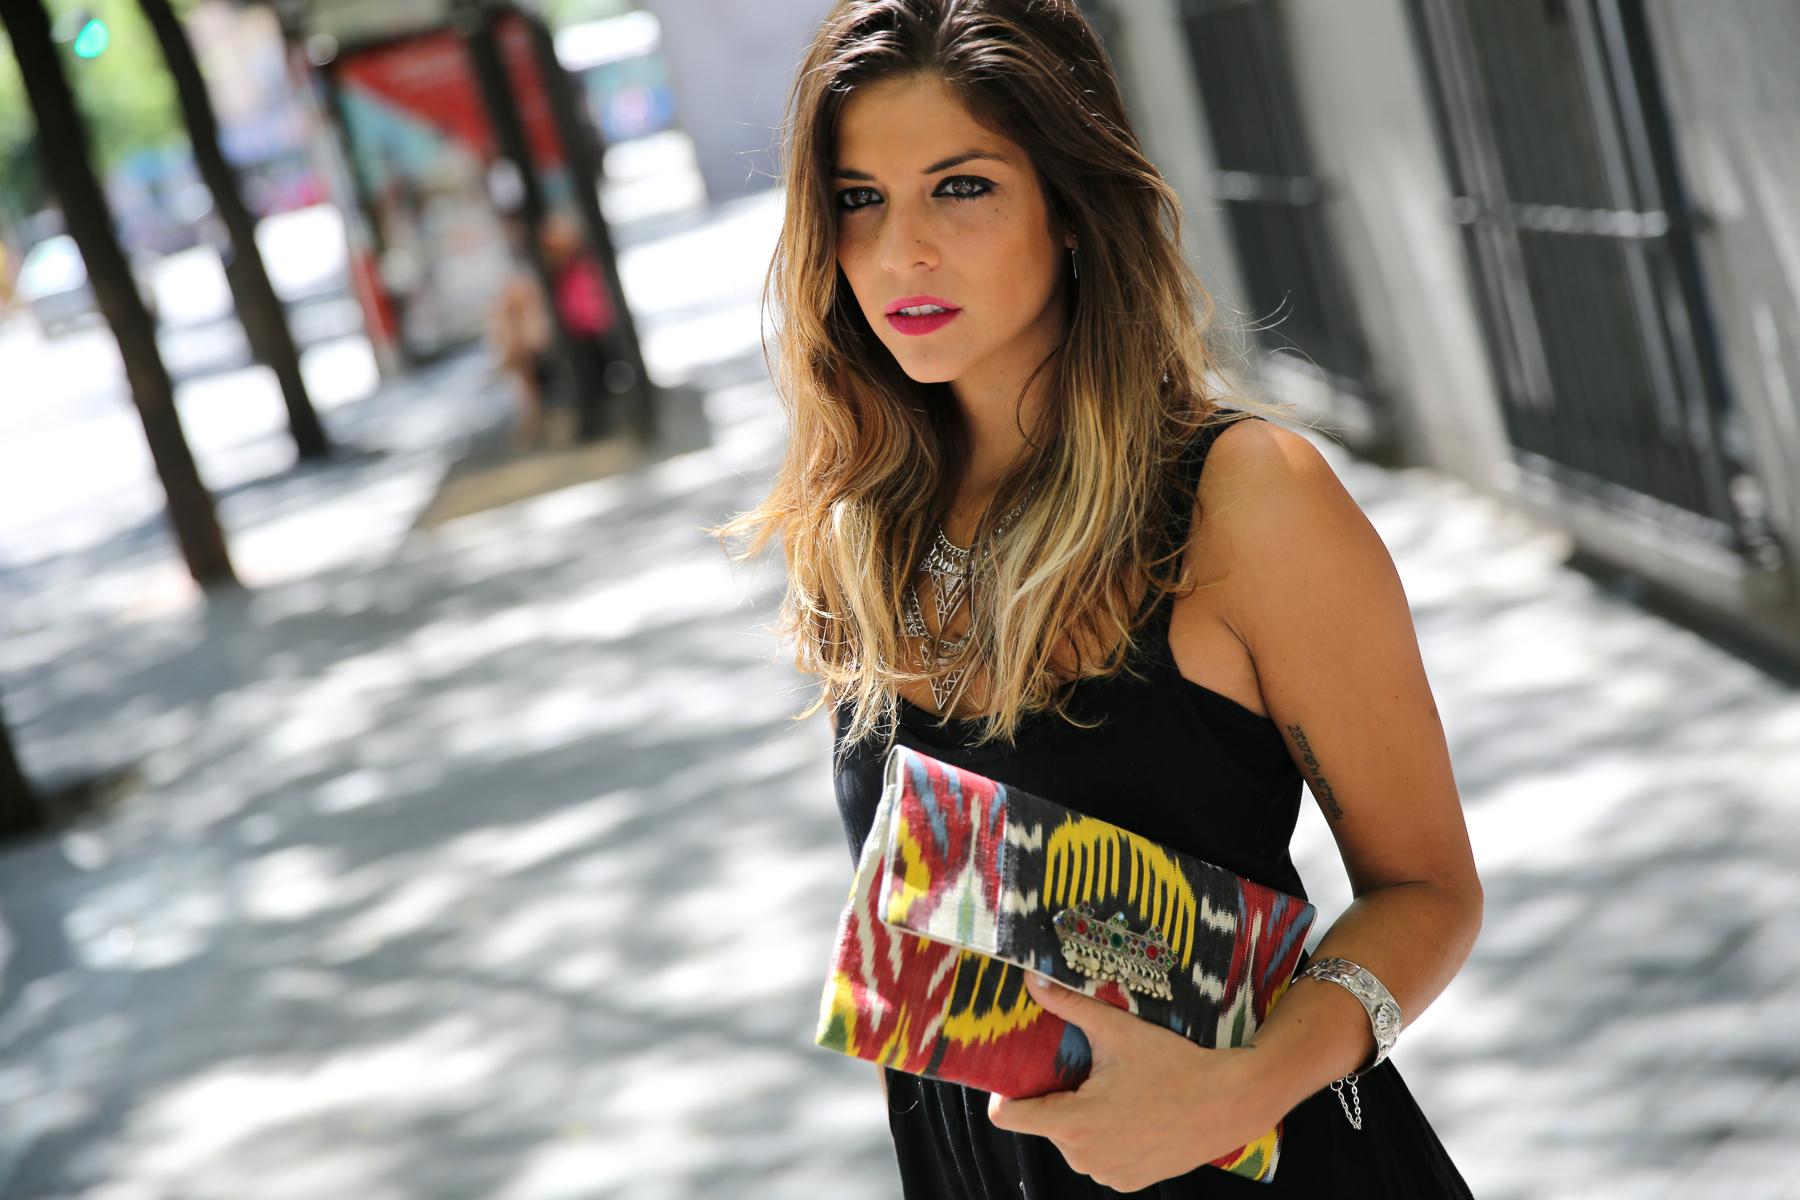 trendy_taste-look-outfit-street_style-ootd-blog-blogger-fashion_spain-moda_españa-ugg_australia-clutch_etnico-vestido_negro-black_dress-brandy_melville-3